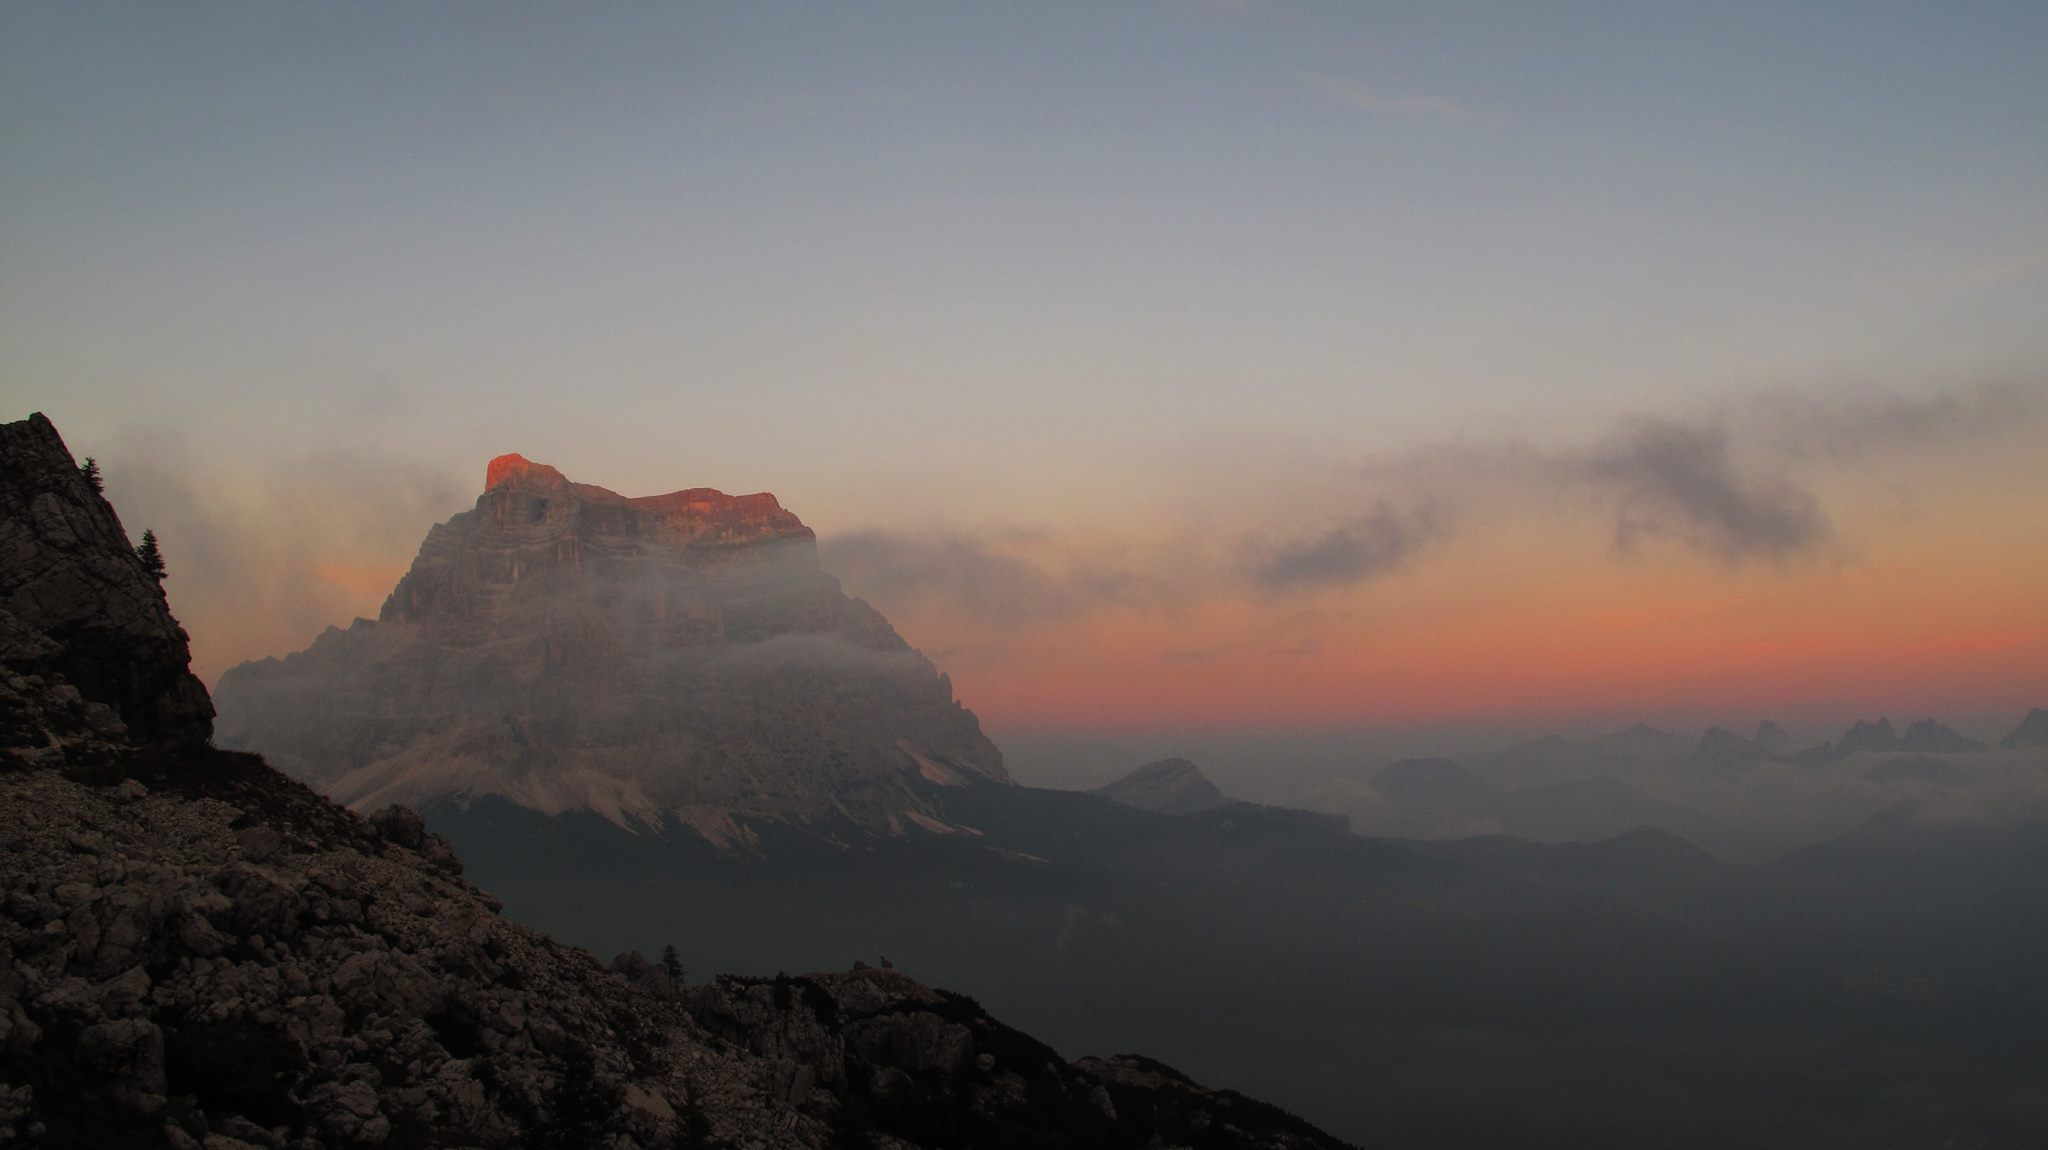 Rifugio Coldai  #italy #dolomiti #hiking #climbing #passion #adventure #sunset #sunsetlovers